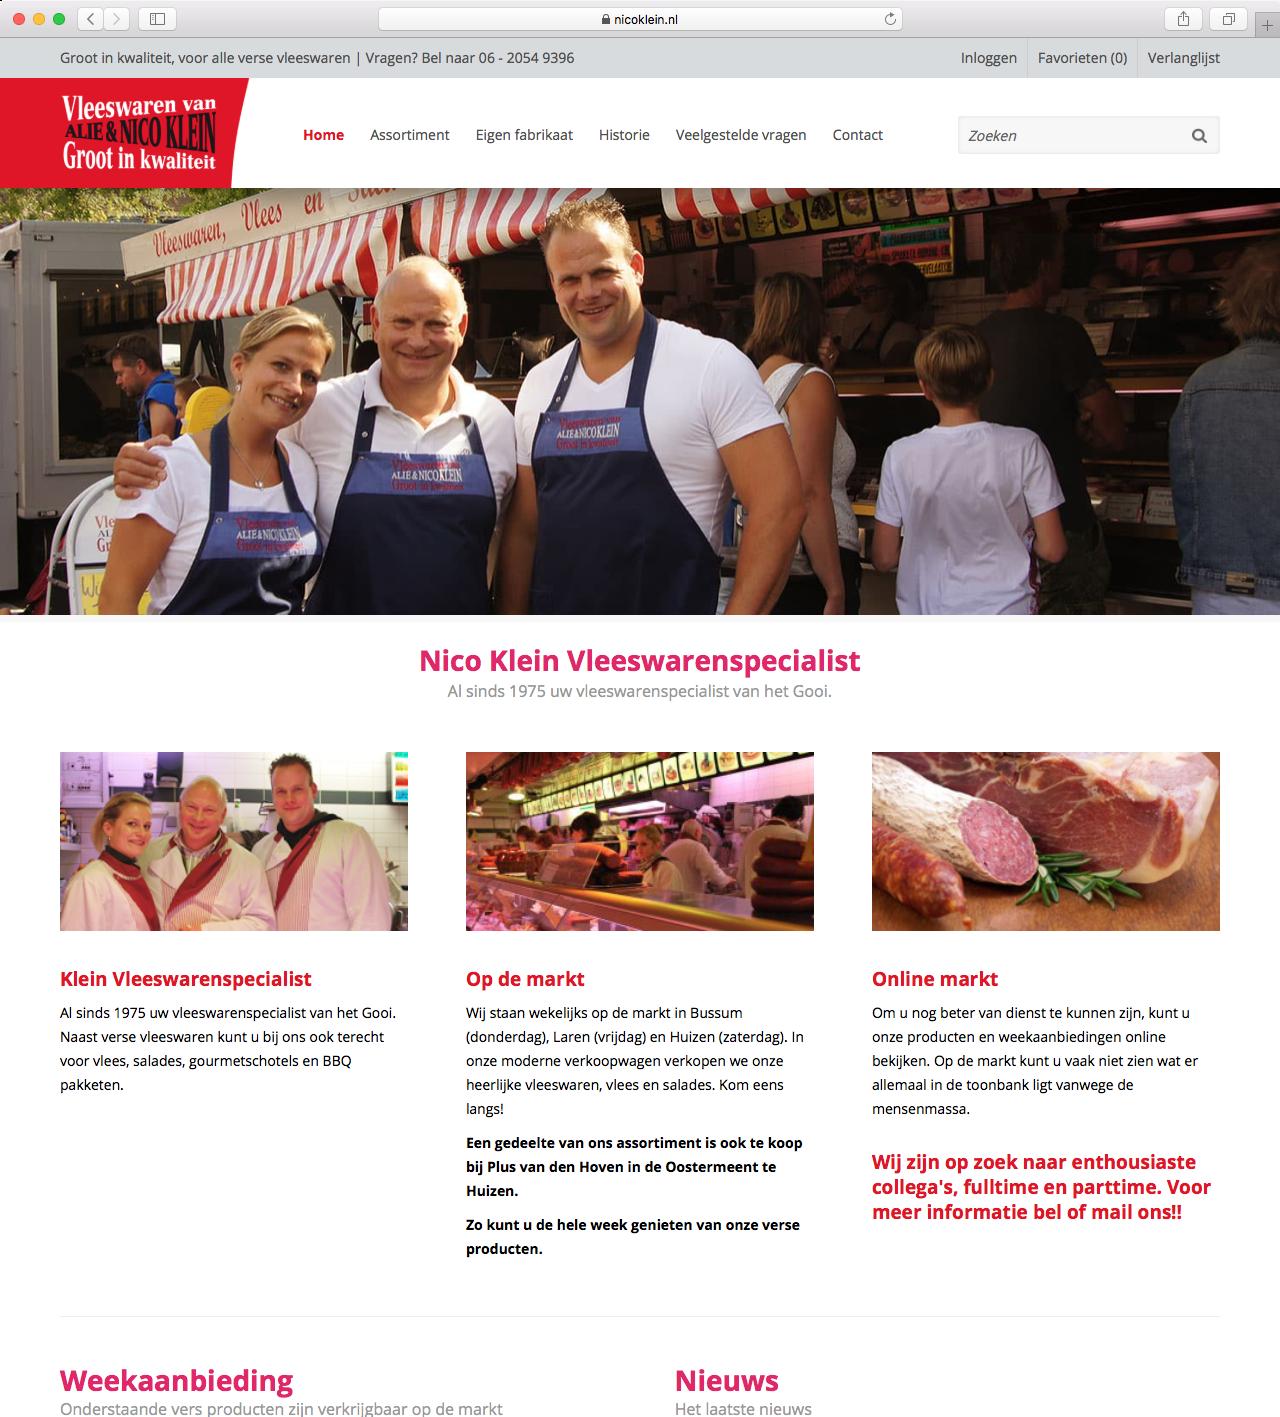 Nico Klein Vleeswaren